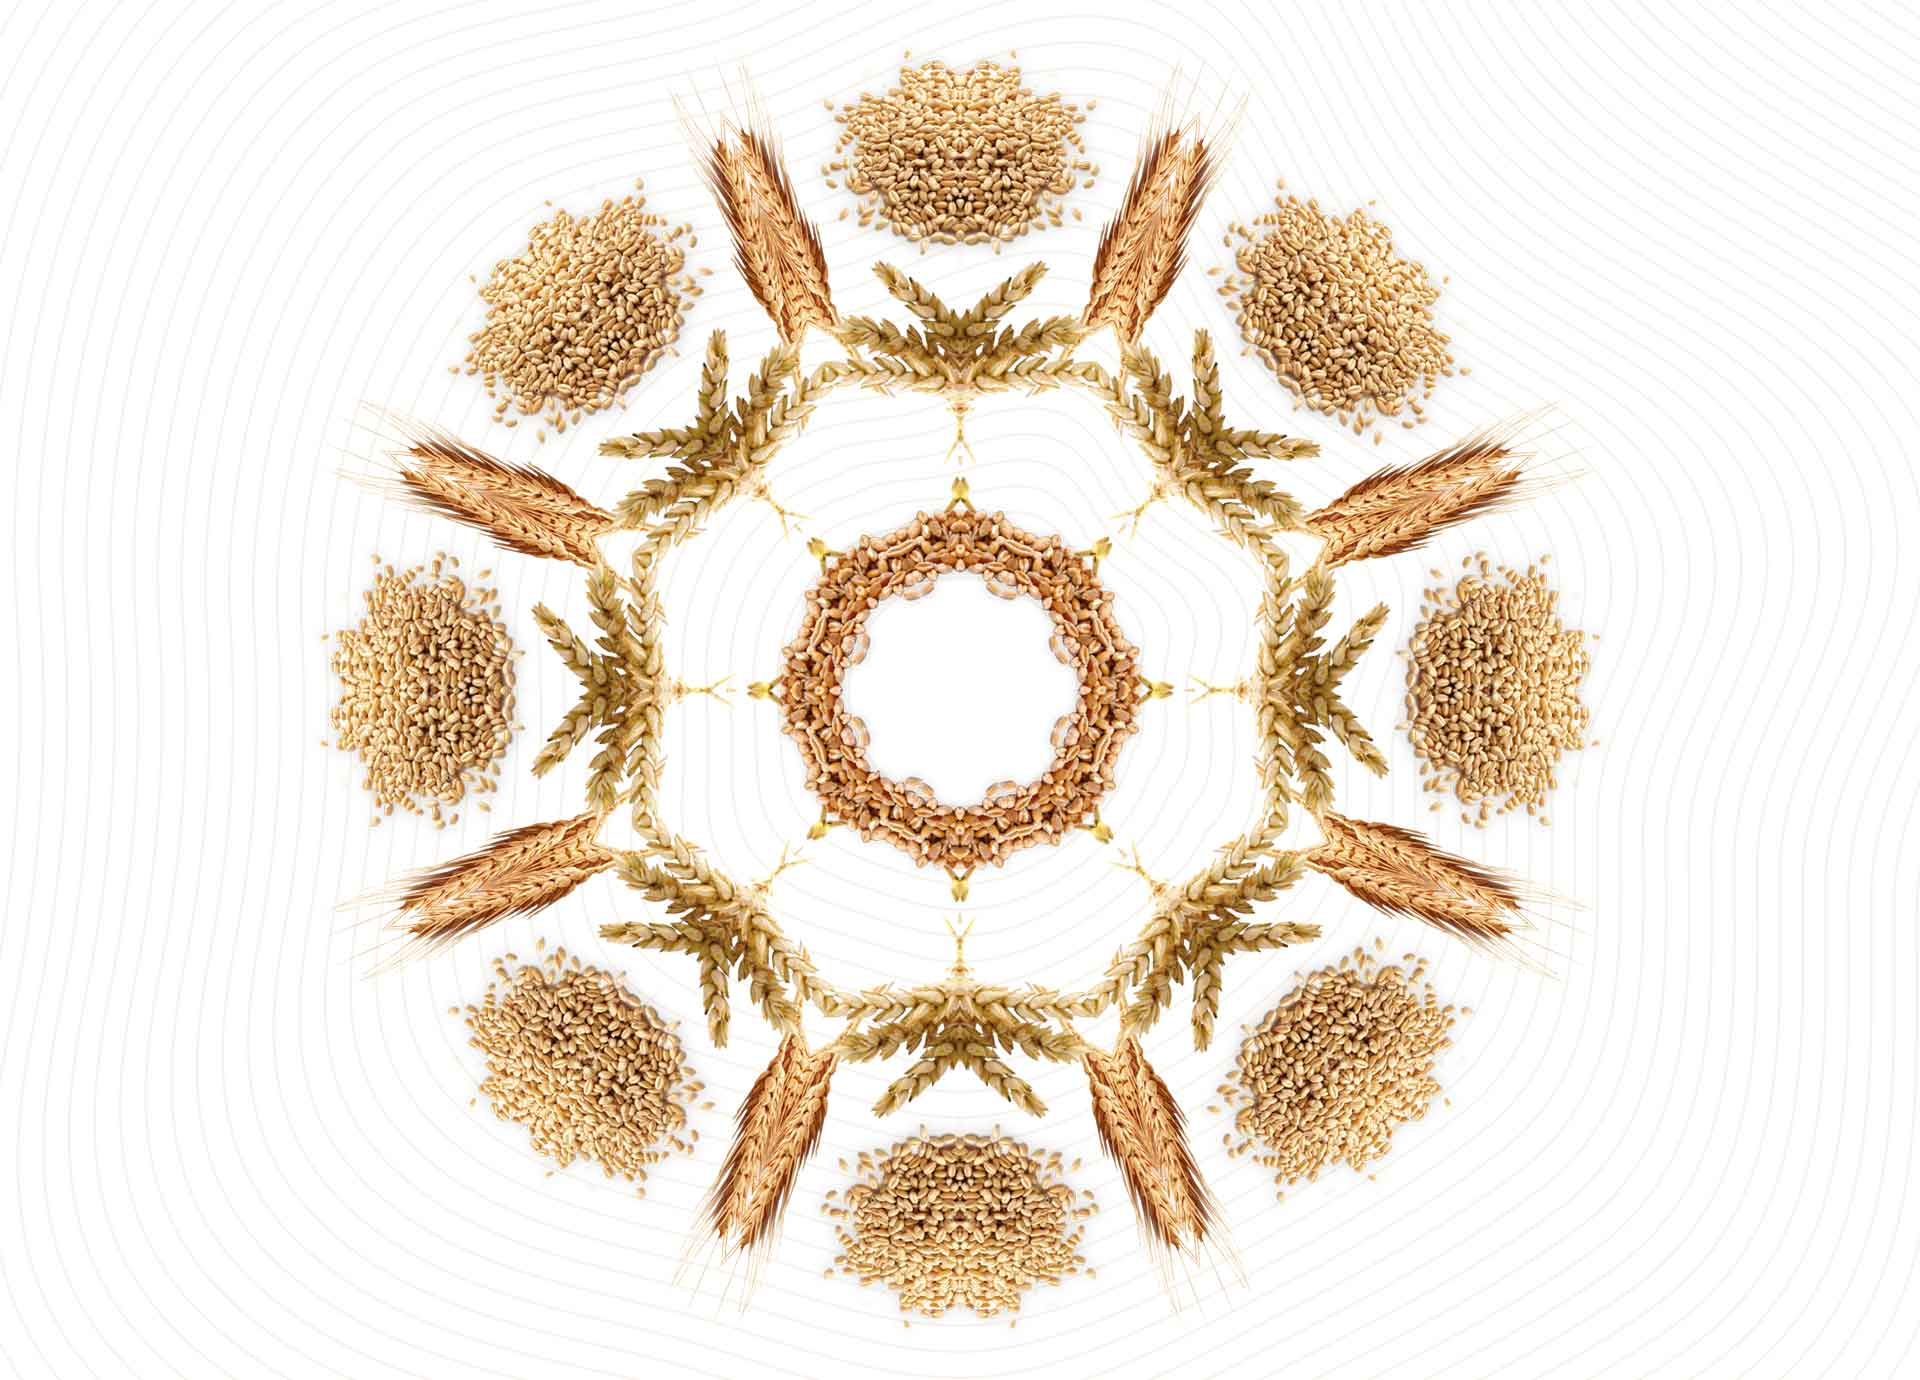 4_gero-apetito_PAKUOTES_kaleidoskopas_1920X1380-maz